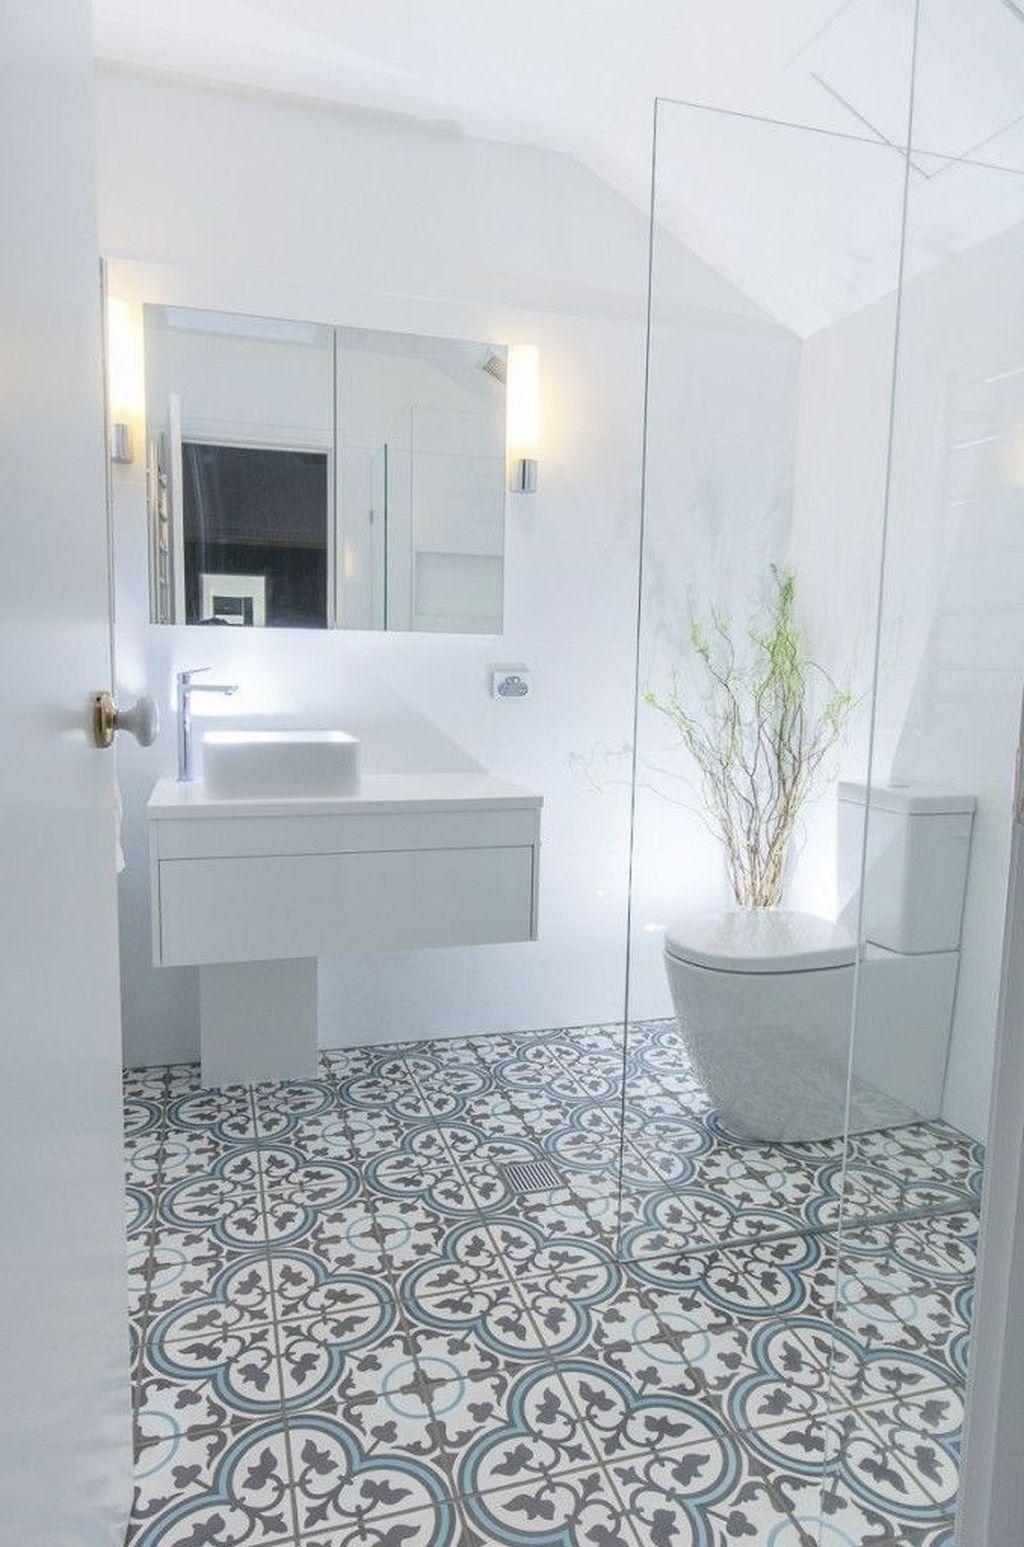 Top Tile Trends For Low Prices Bathroom Remodel Pictures Bathroom Inspiration Decor Bathroom Remodel Designs